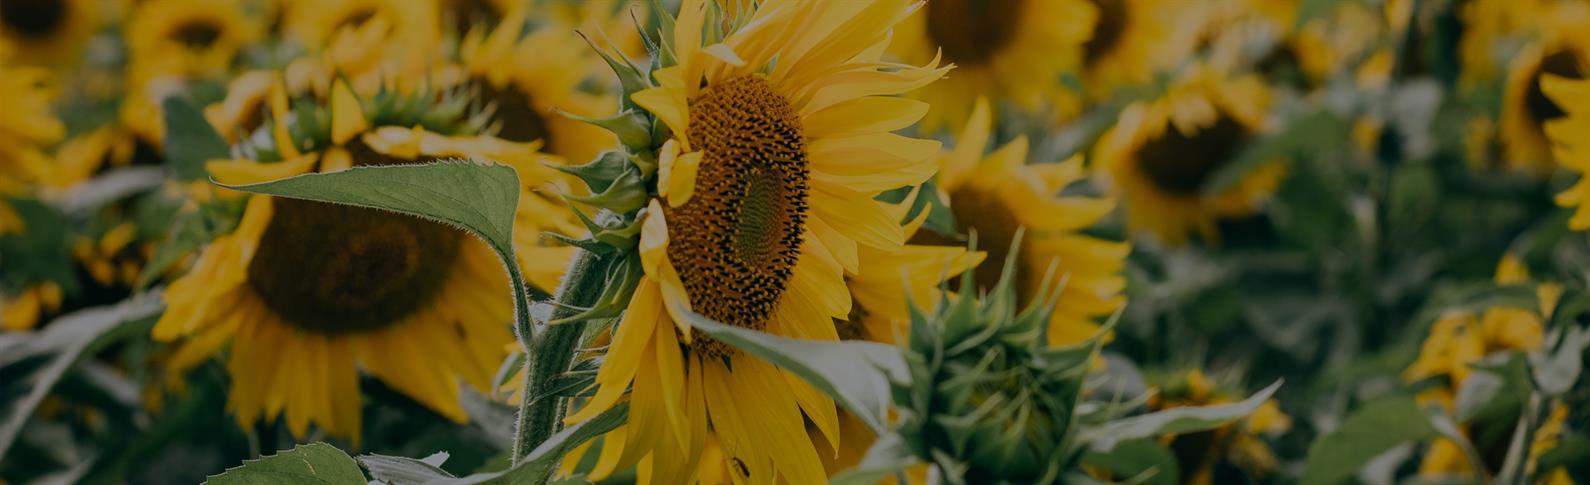 SliderImageSunflower